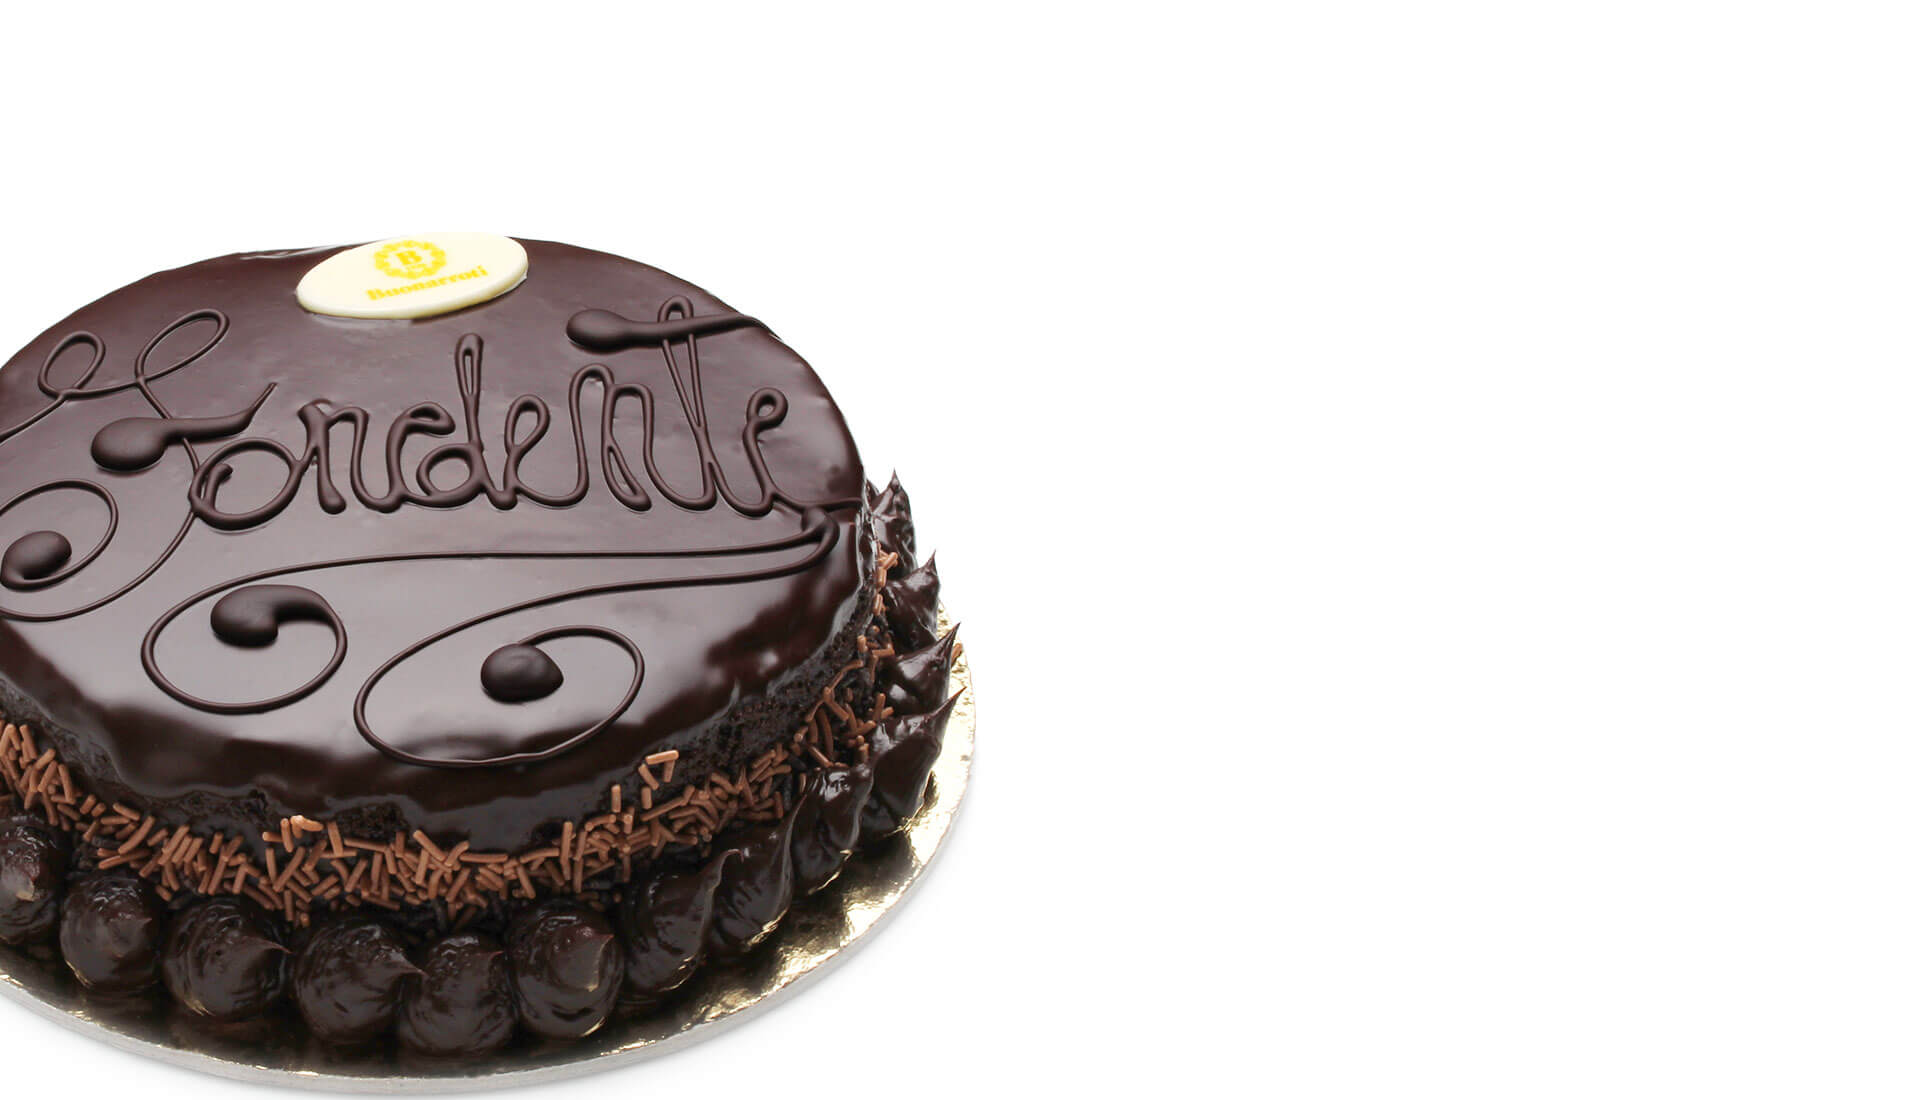 torte pasticceria milano buonarroti